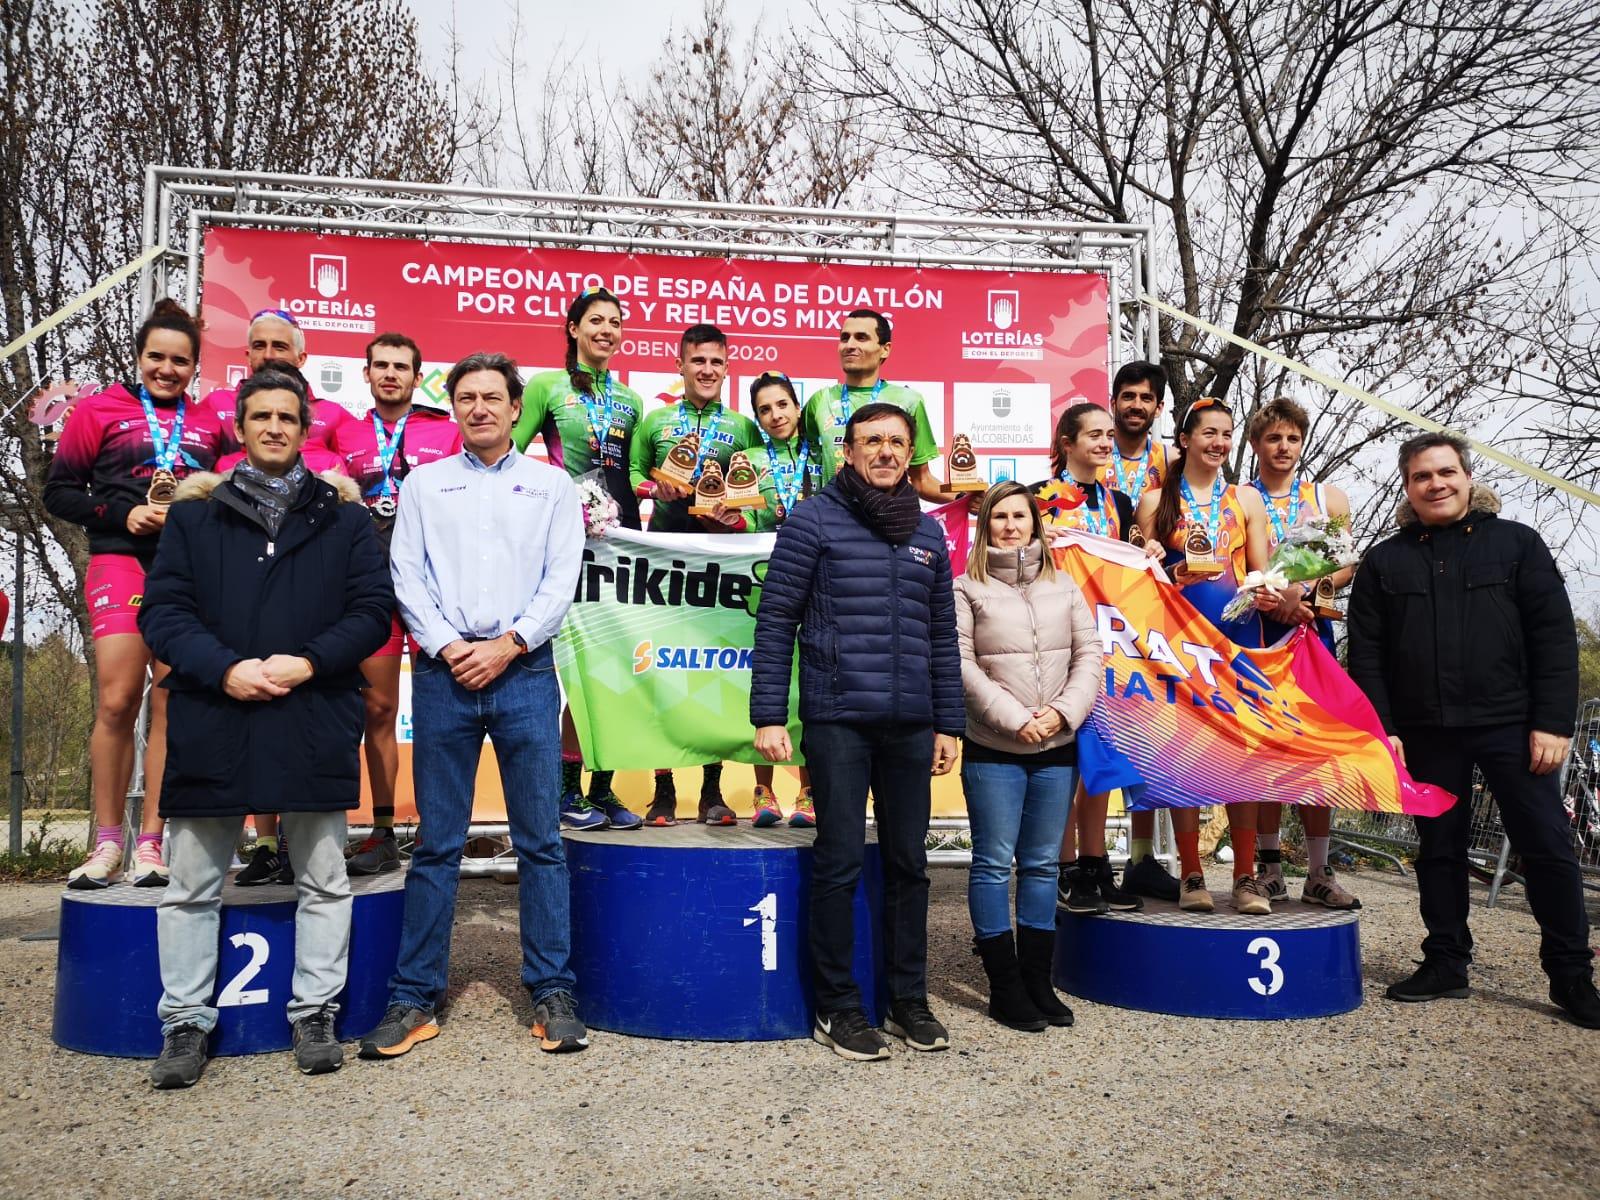 Saltoki Trikideak Campeones de España de Duatlón por Relevos Mixtos